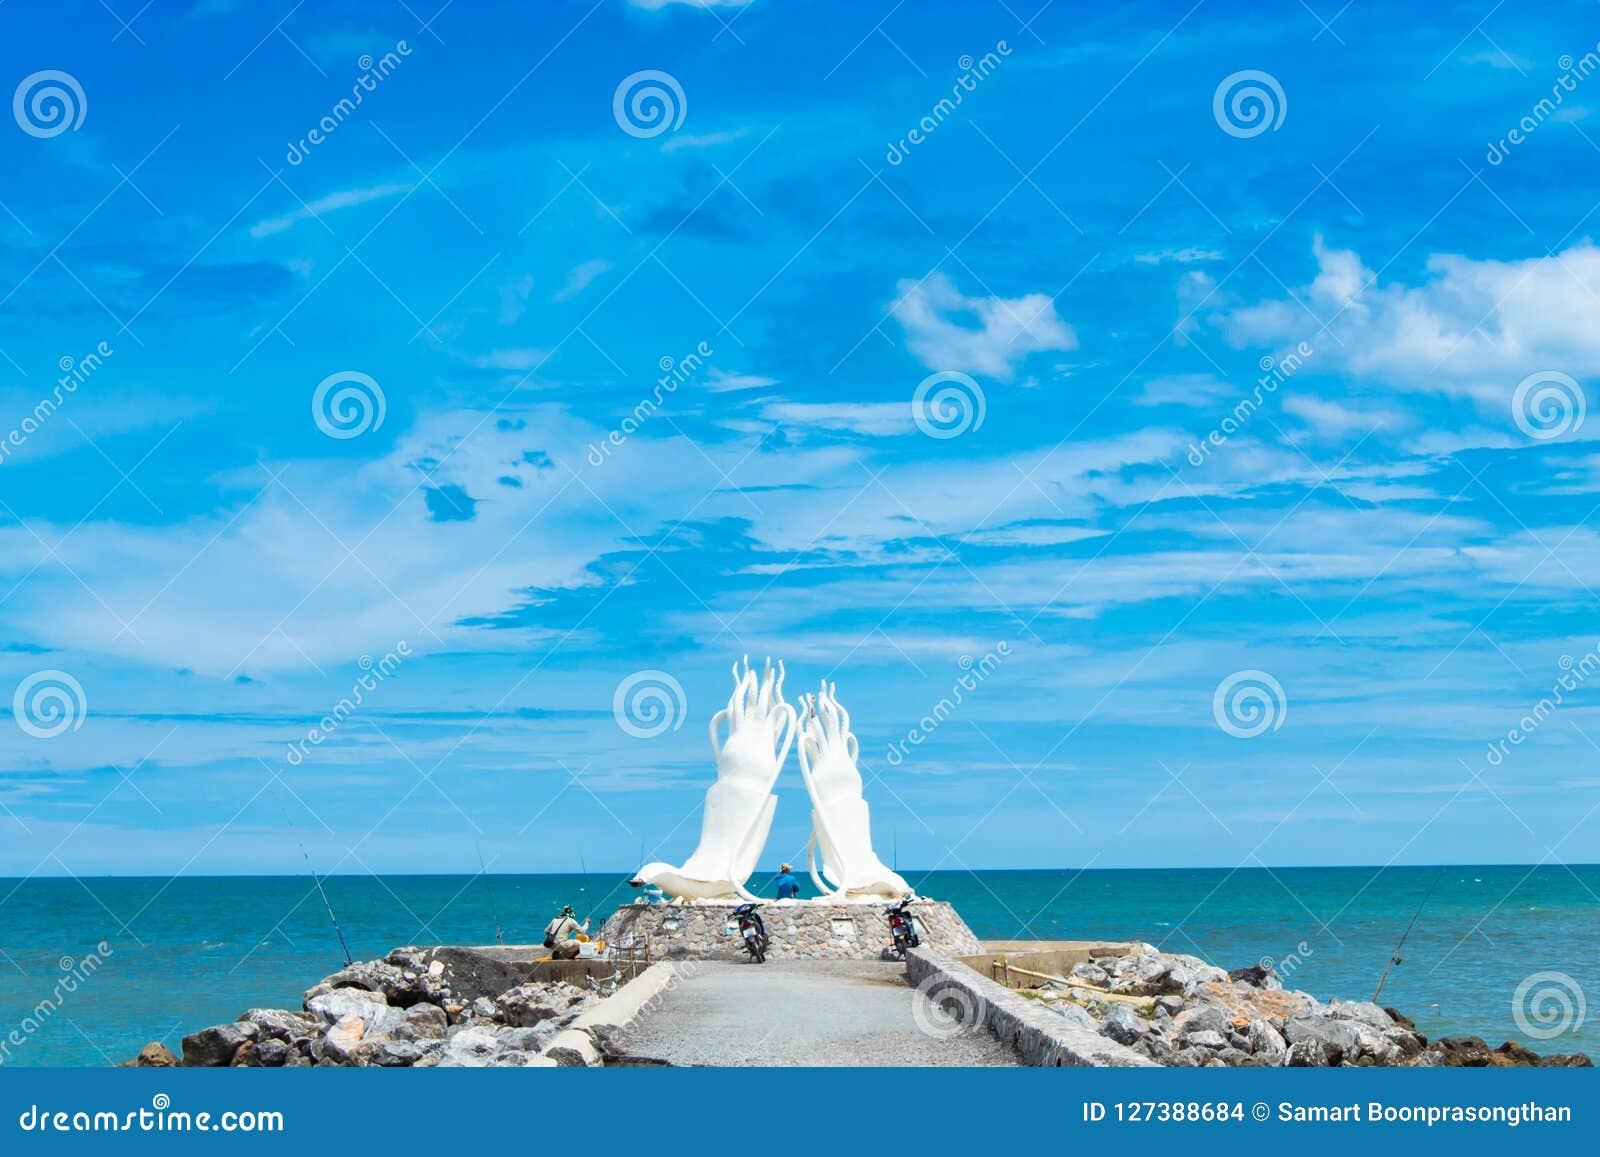 White Statue Squid And Sea Stock Photo Image Of Bali Croatia